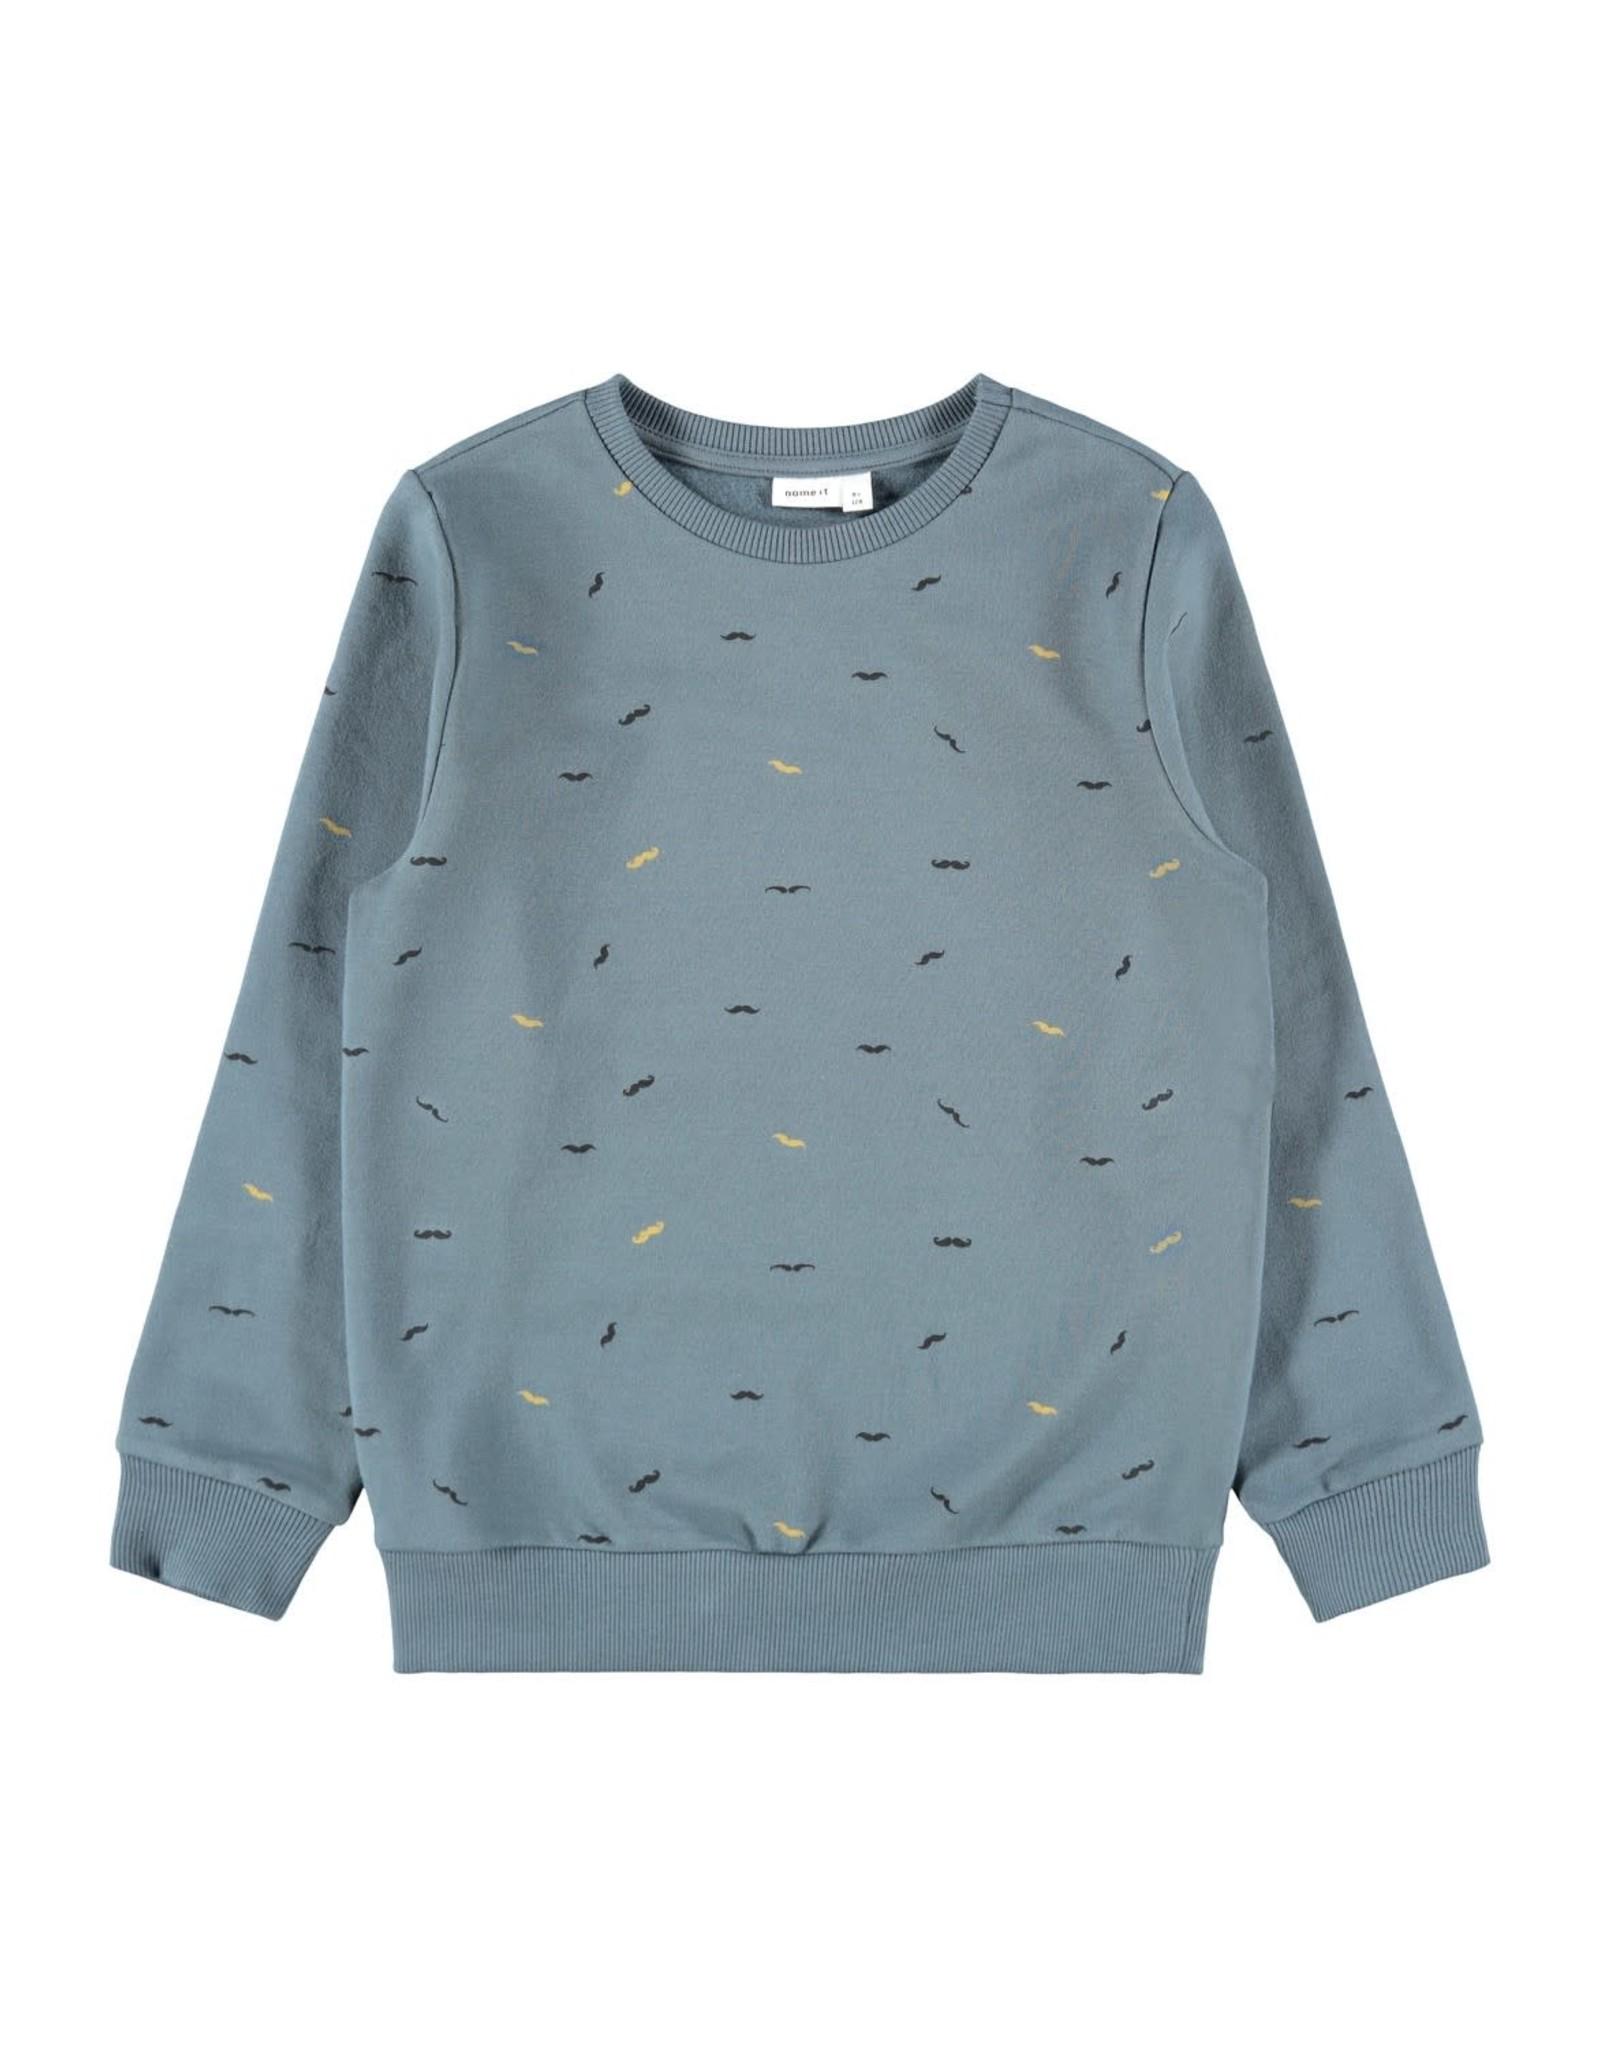 Name It Blauwe sweater trui met snorren print